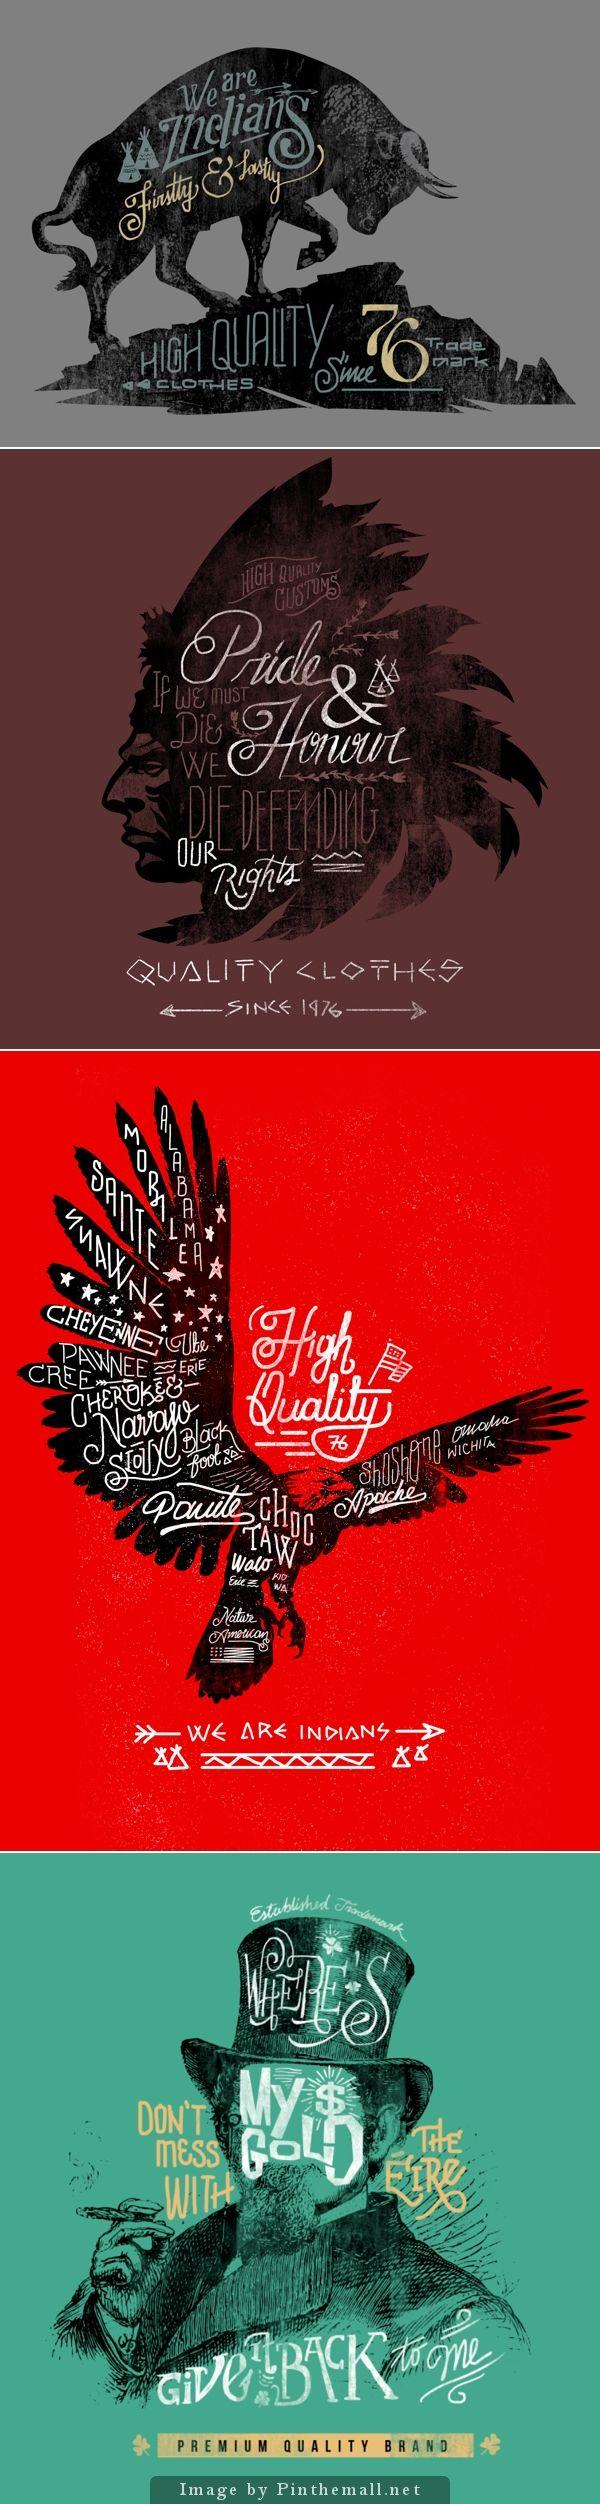 Handmade Vol 1. by Fausto Baena Garcés via Behance http://www.typographyserved.com/gallery/Handmade-Vol-1/14787843